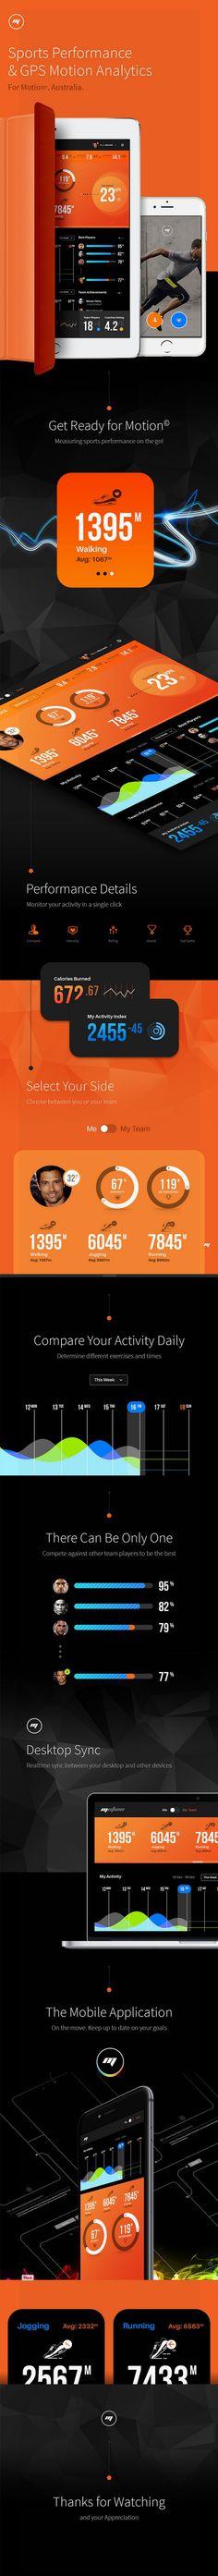 Dashboard - Motion - Sports Performance - Motion analytics